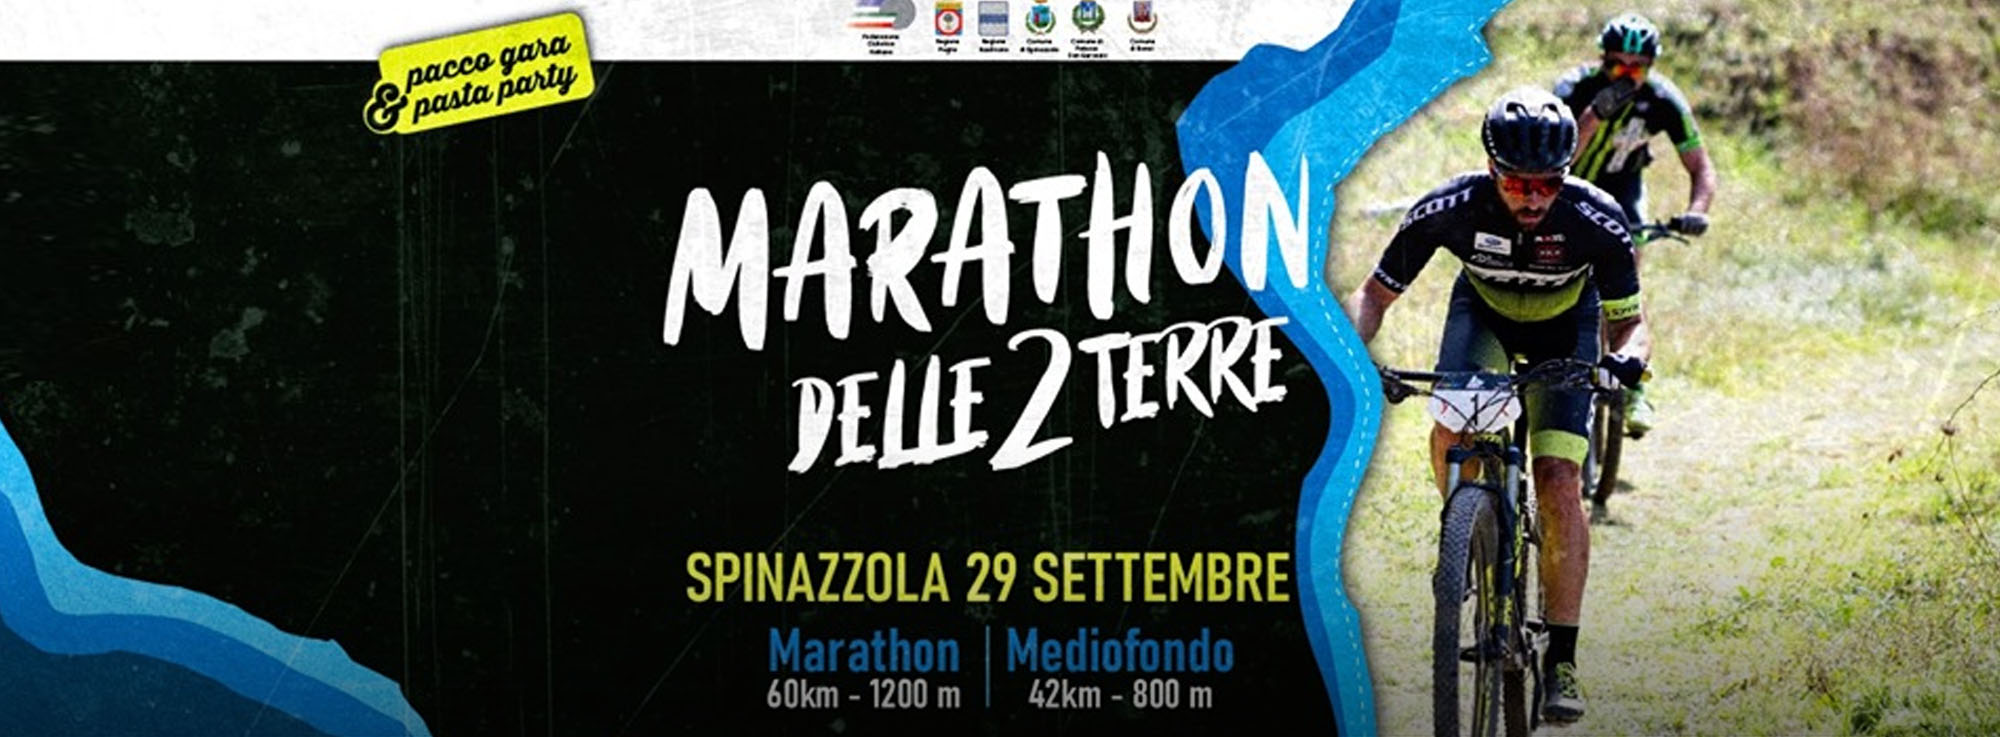 Spinazzola: Marathon delle Due Terre